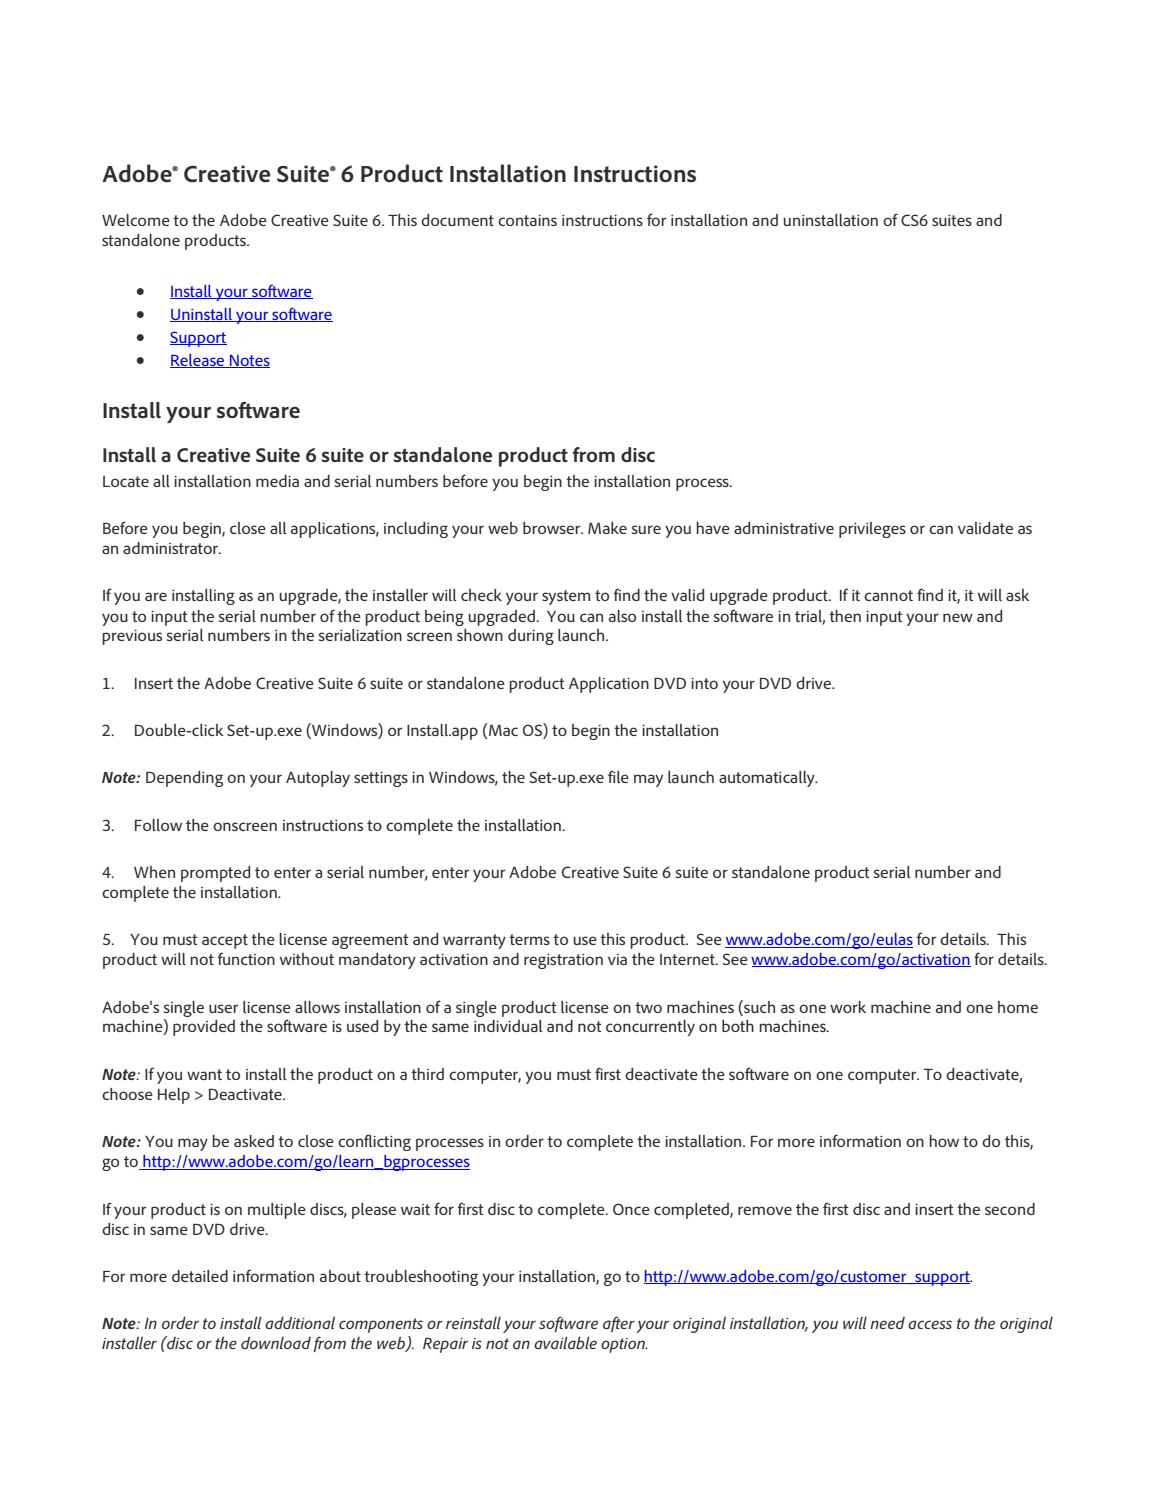 Installation instructions by scaffoldingvn - issuu